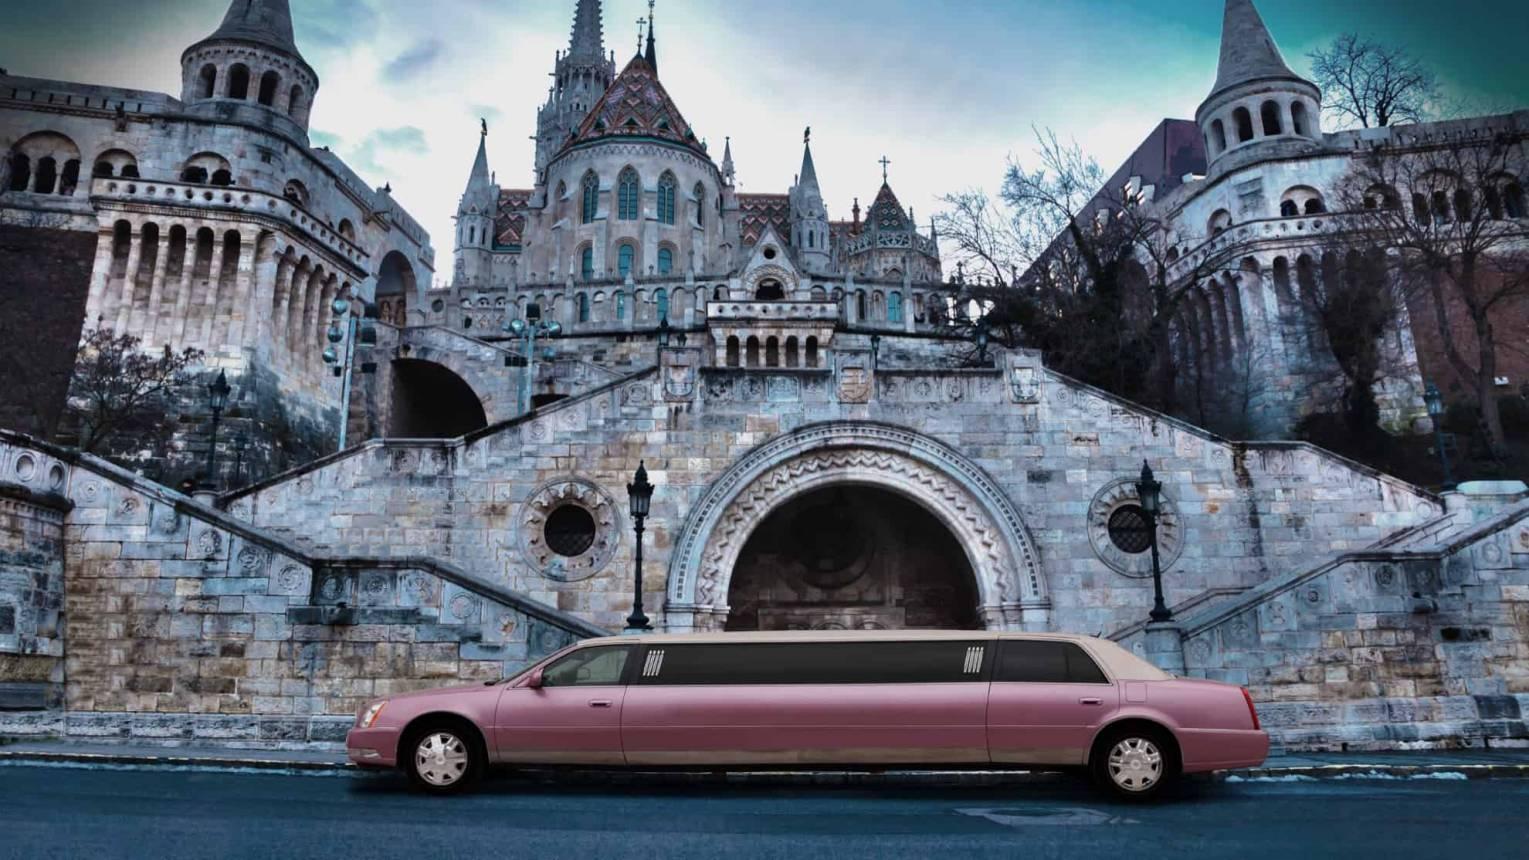 Pink Cadillac limuzin